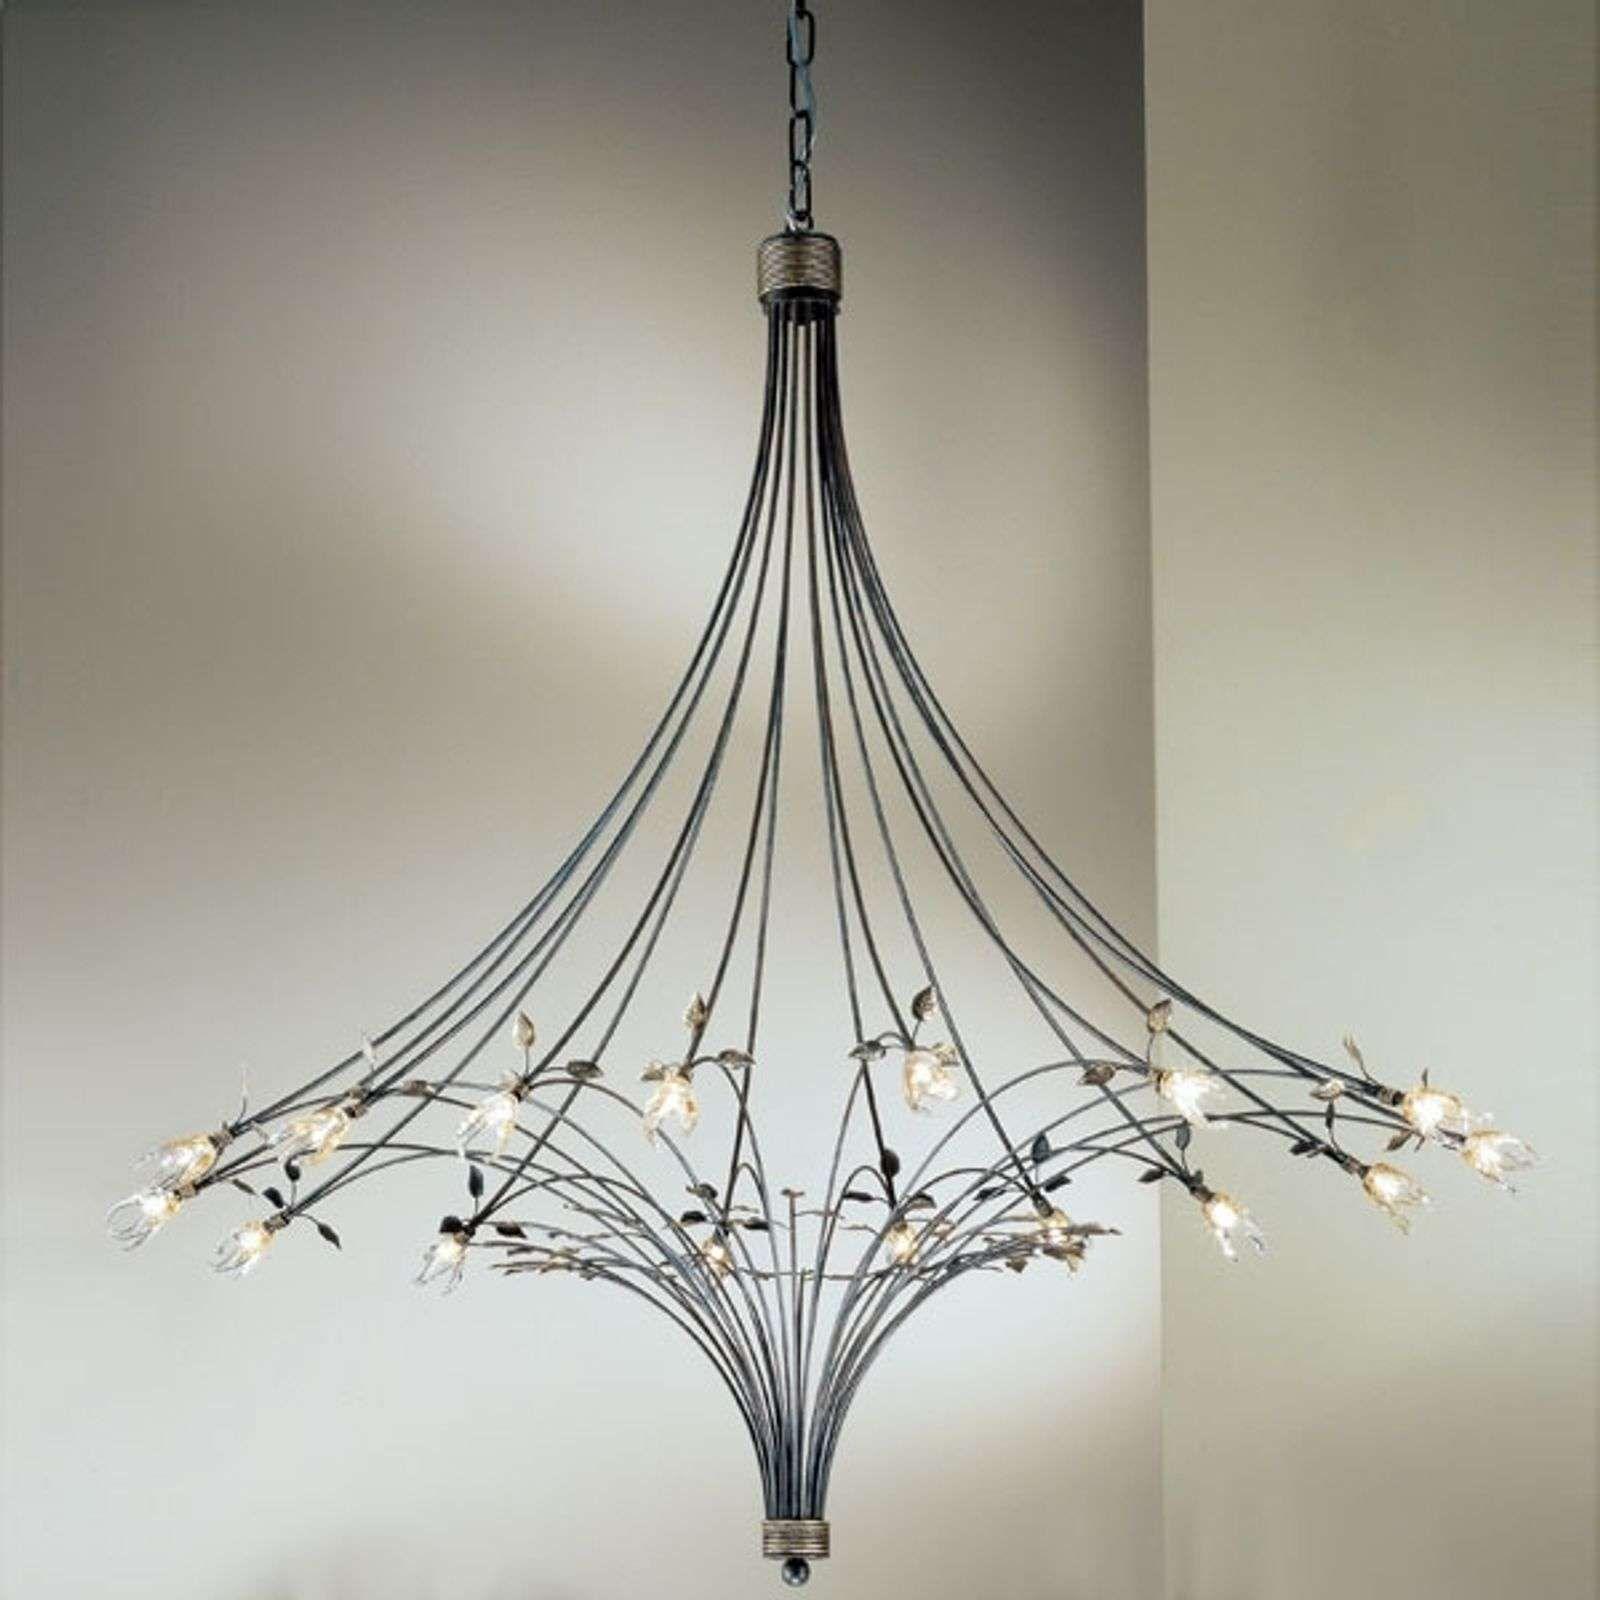 Imposante Kroonluchter Millefoglie 16 Lichts Van Kogl Muranoglas Lampen En Lampen24